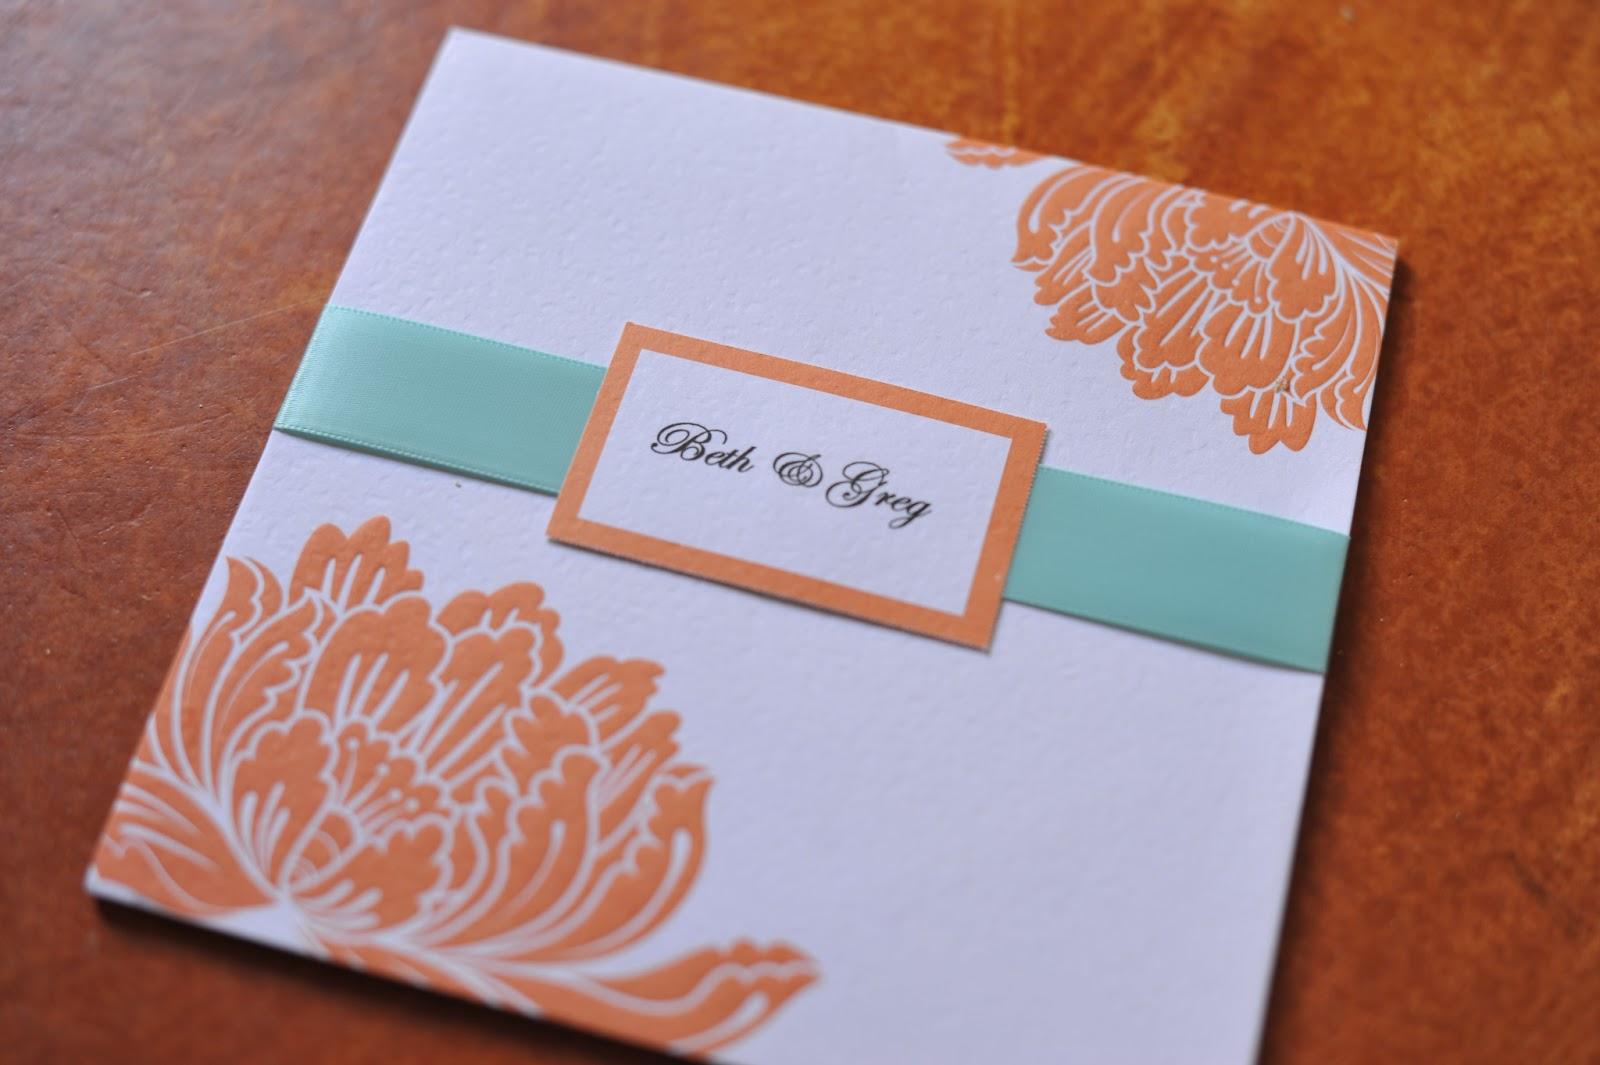 orange and turquoise wedding invitations. wedding invitations orange and turquoise